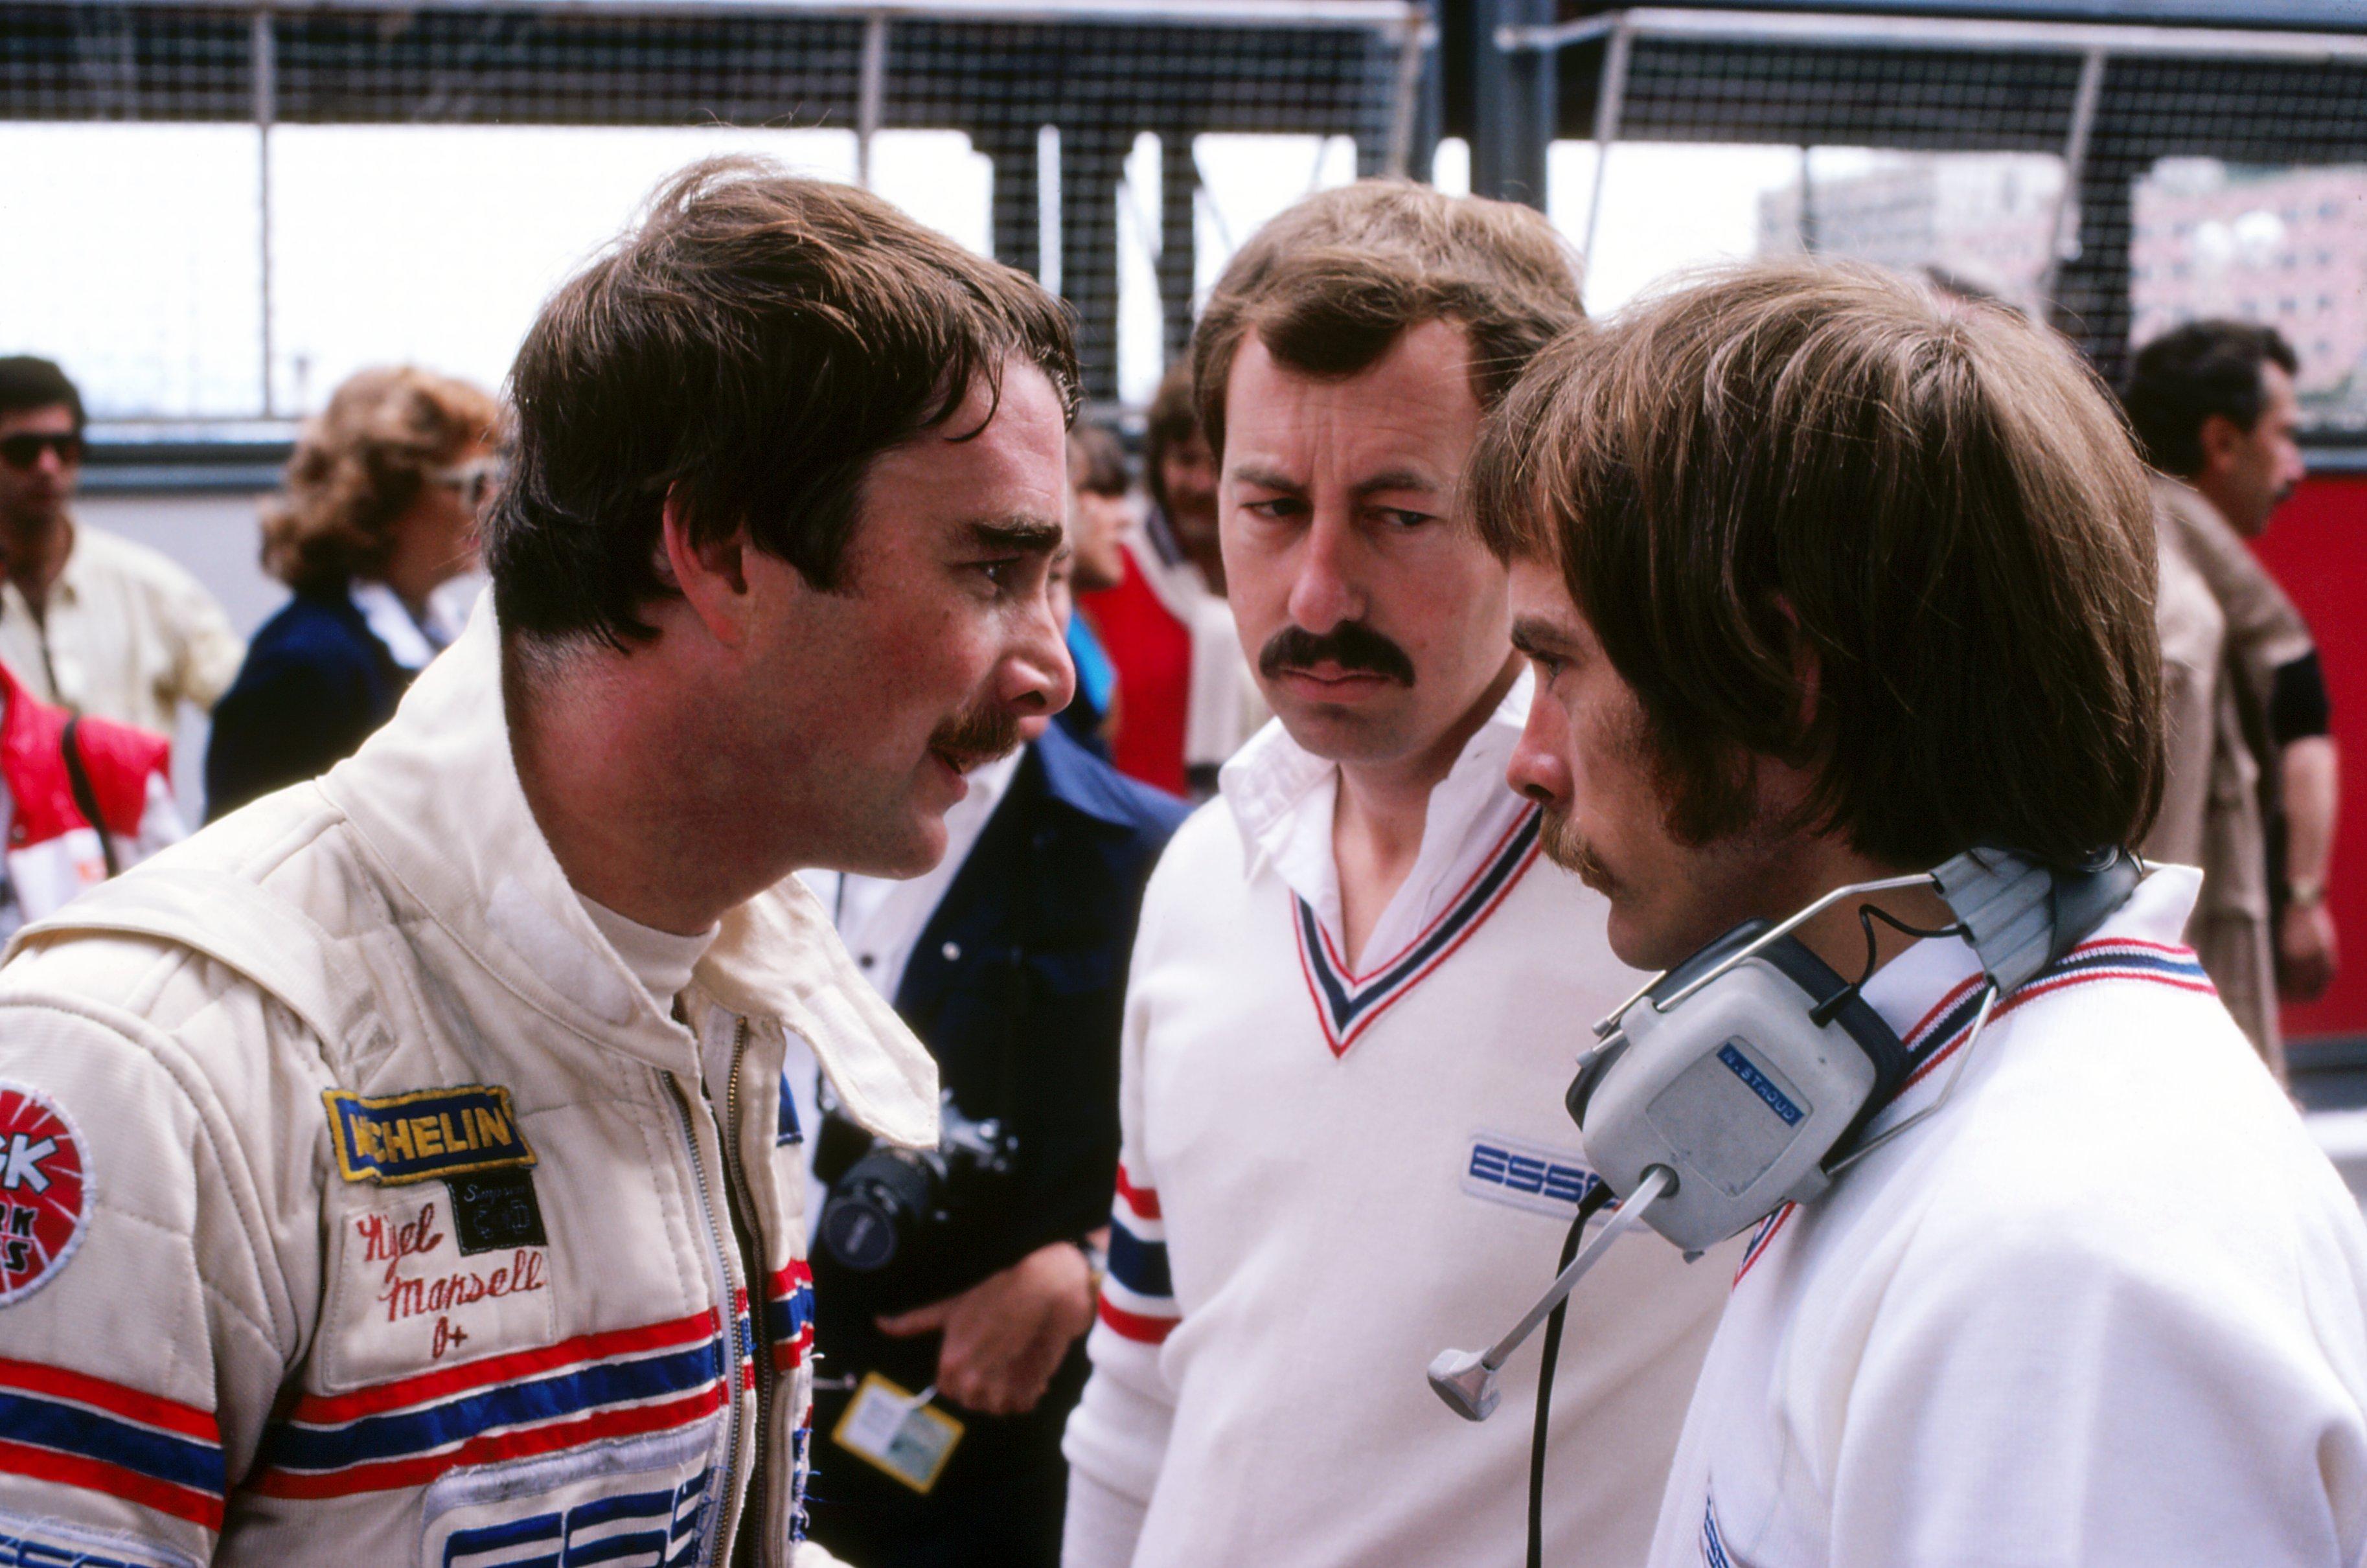 (L to R): Nigel Mansell (GBR) Lotus; Peter Collins (AUS) Lotus Team Manager and Nigel Stroud (GBR) Lotus Engineer. Monaco Grand Prix, Rd6, Monte-Carlo, Monaco, 31 May 1981. BEST IMAGE